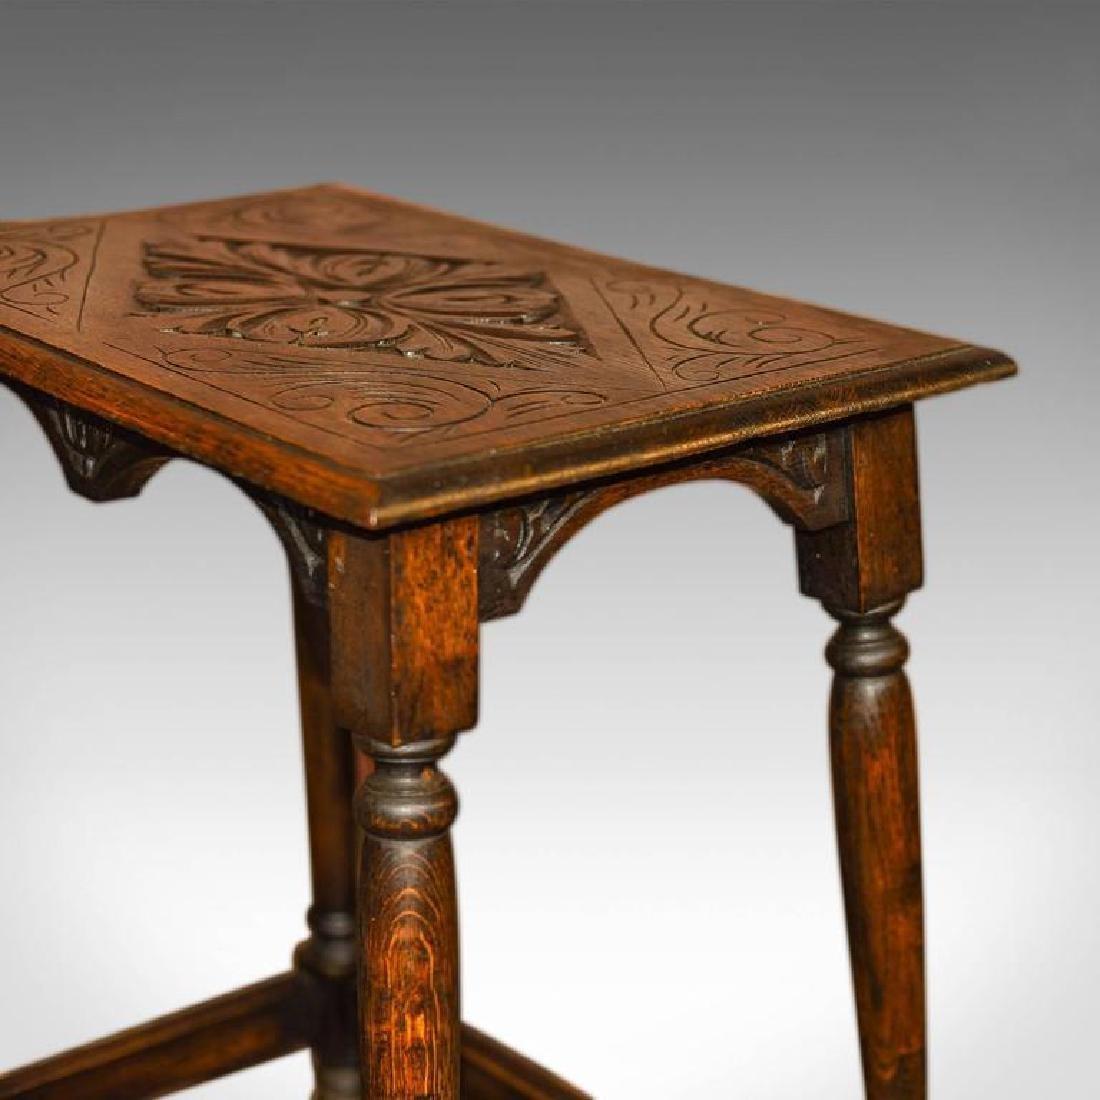 Antique Wardrobe, Carved Mahogany, English, Compactum, - 7